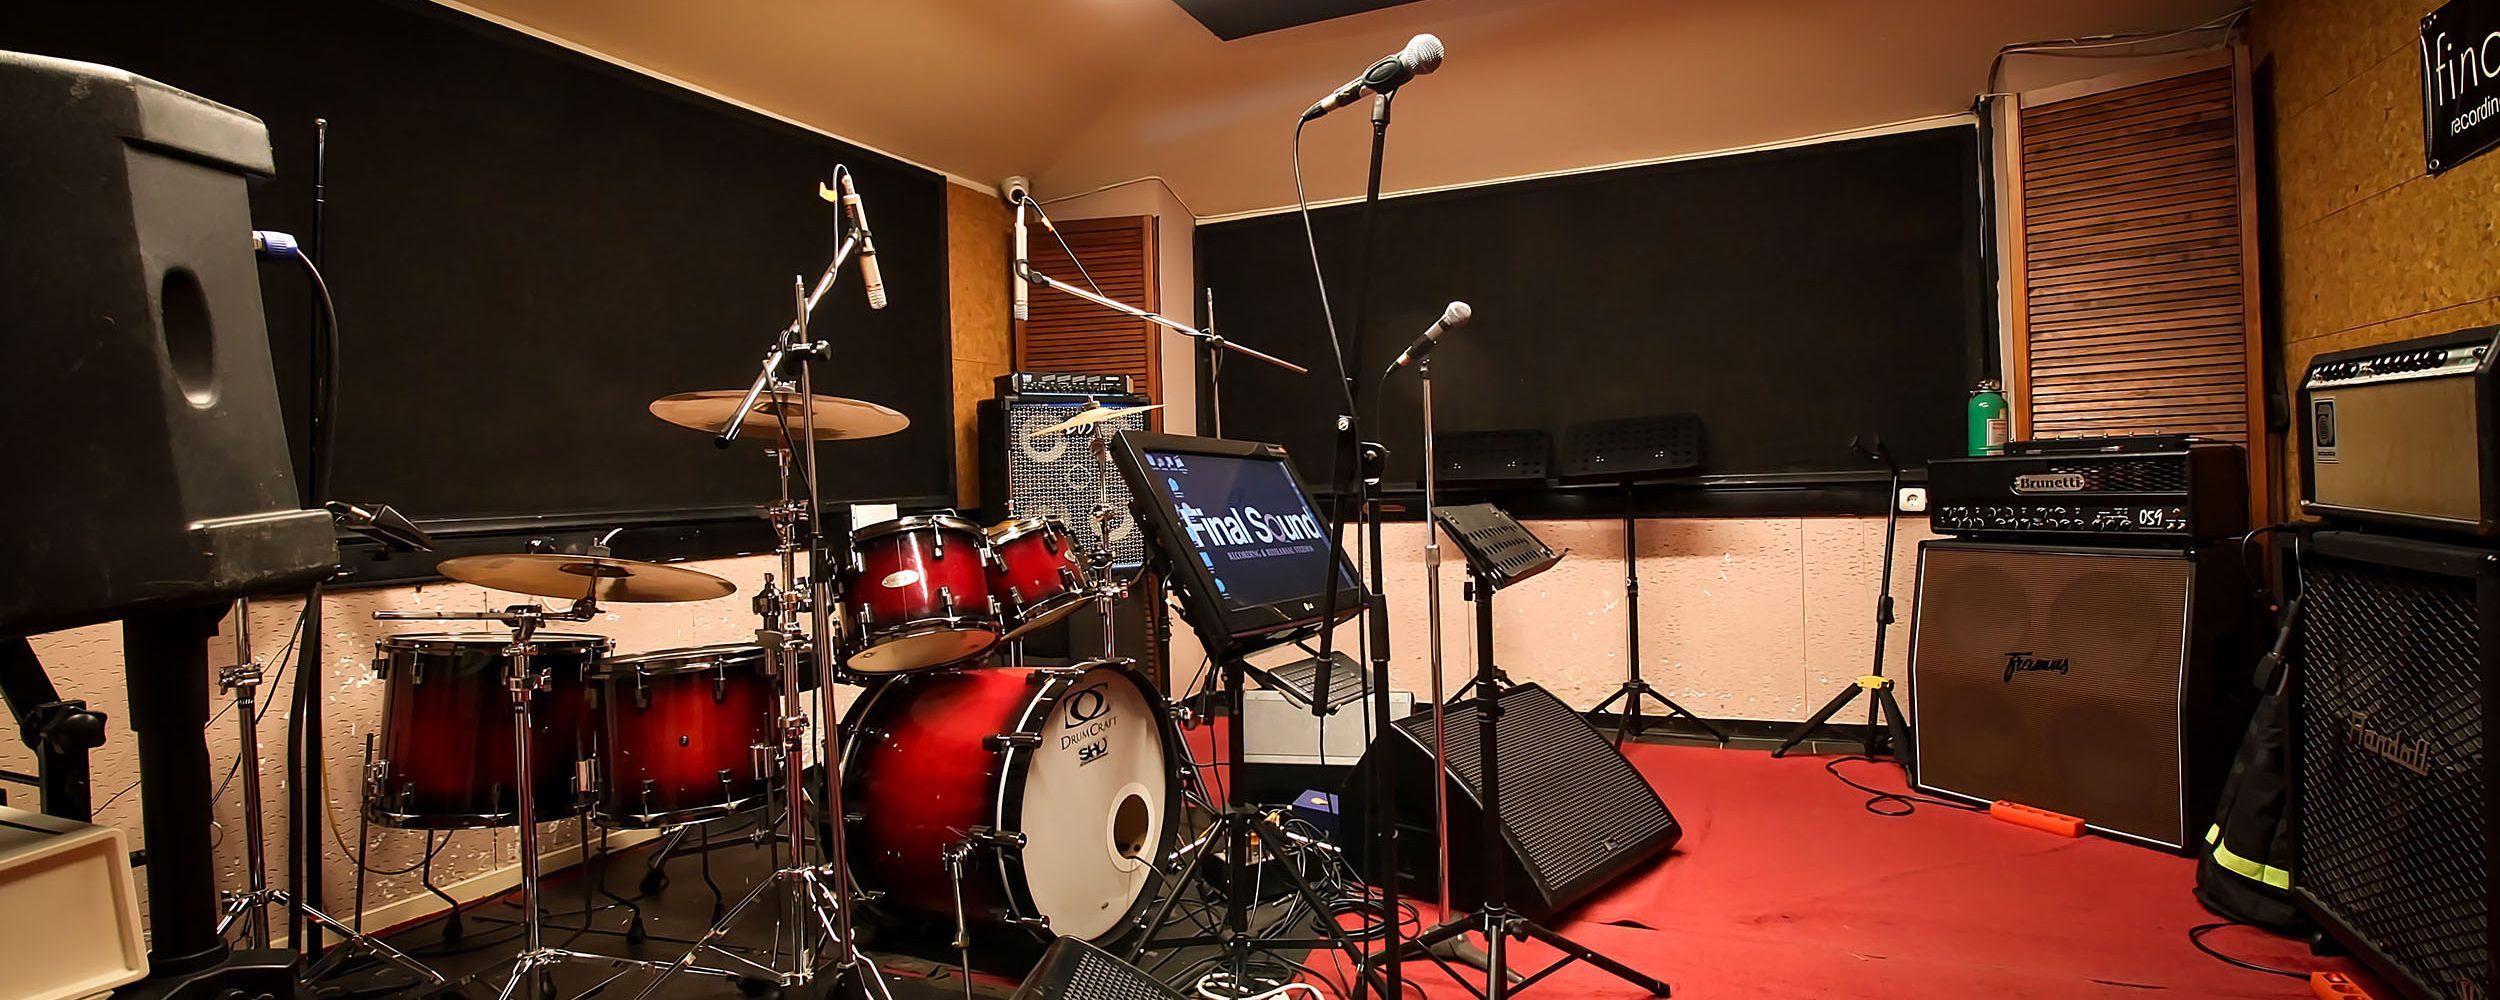 Final Sound Rehearsal 05